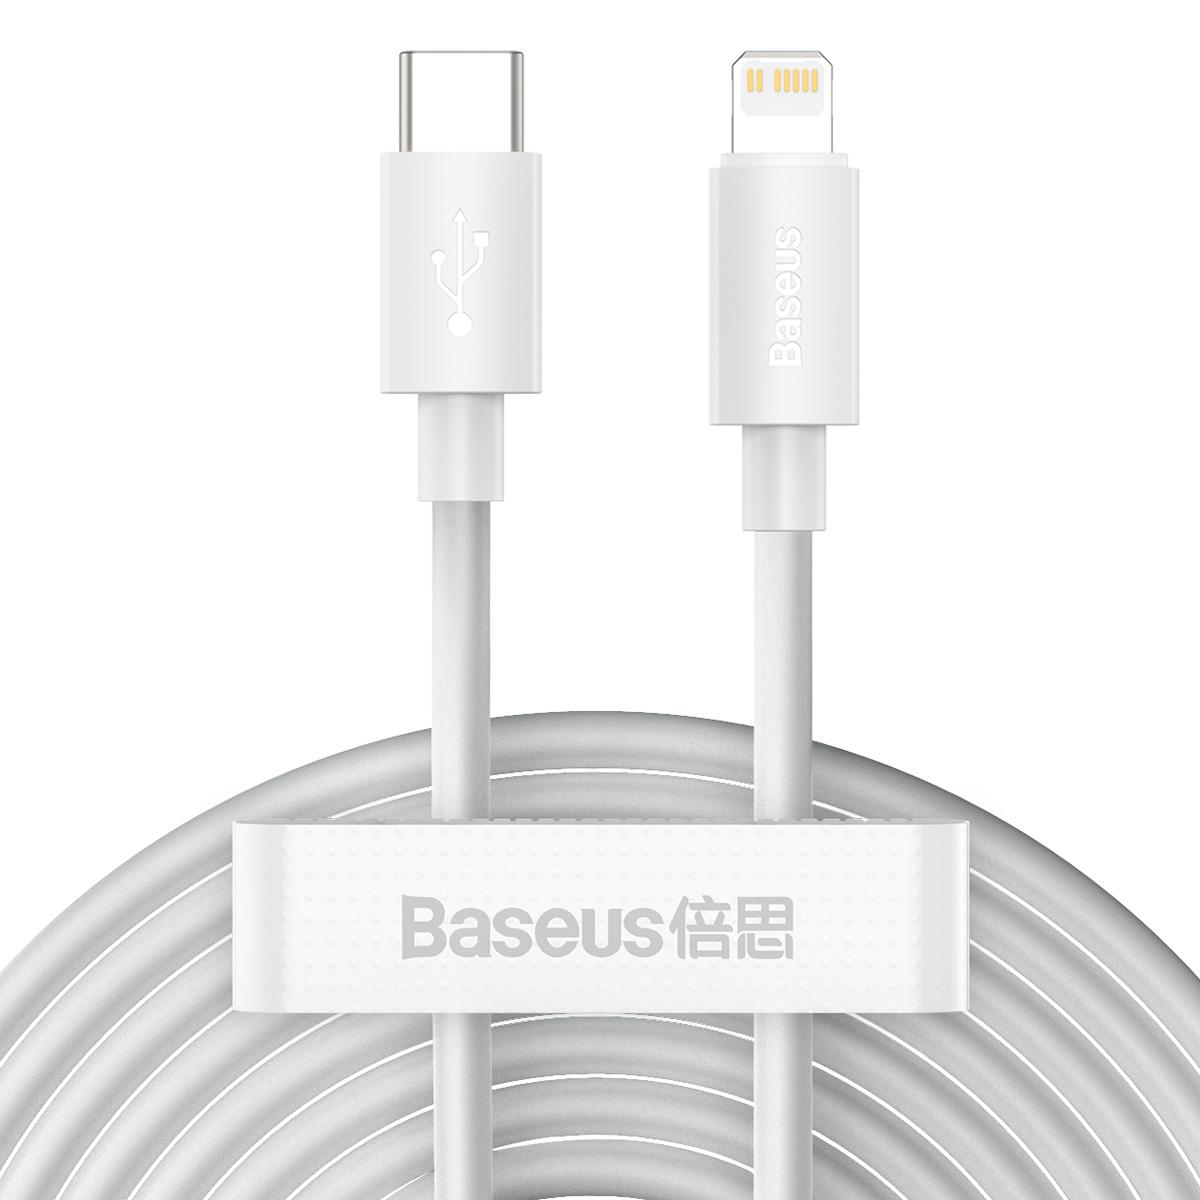 Baseus Simple USB-C-Lightning-kabel, PD, 20W, 1.5m, 2-pack